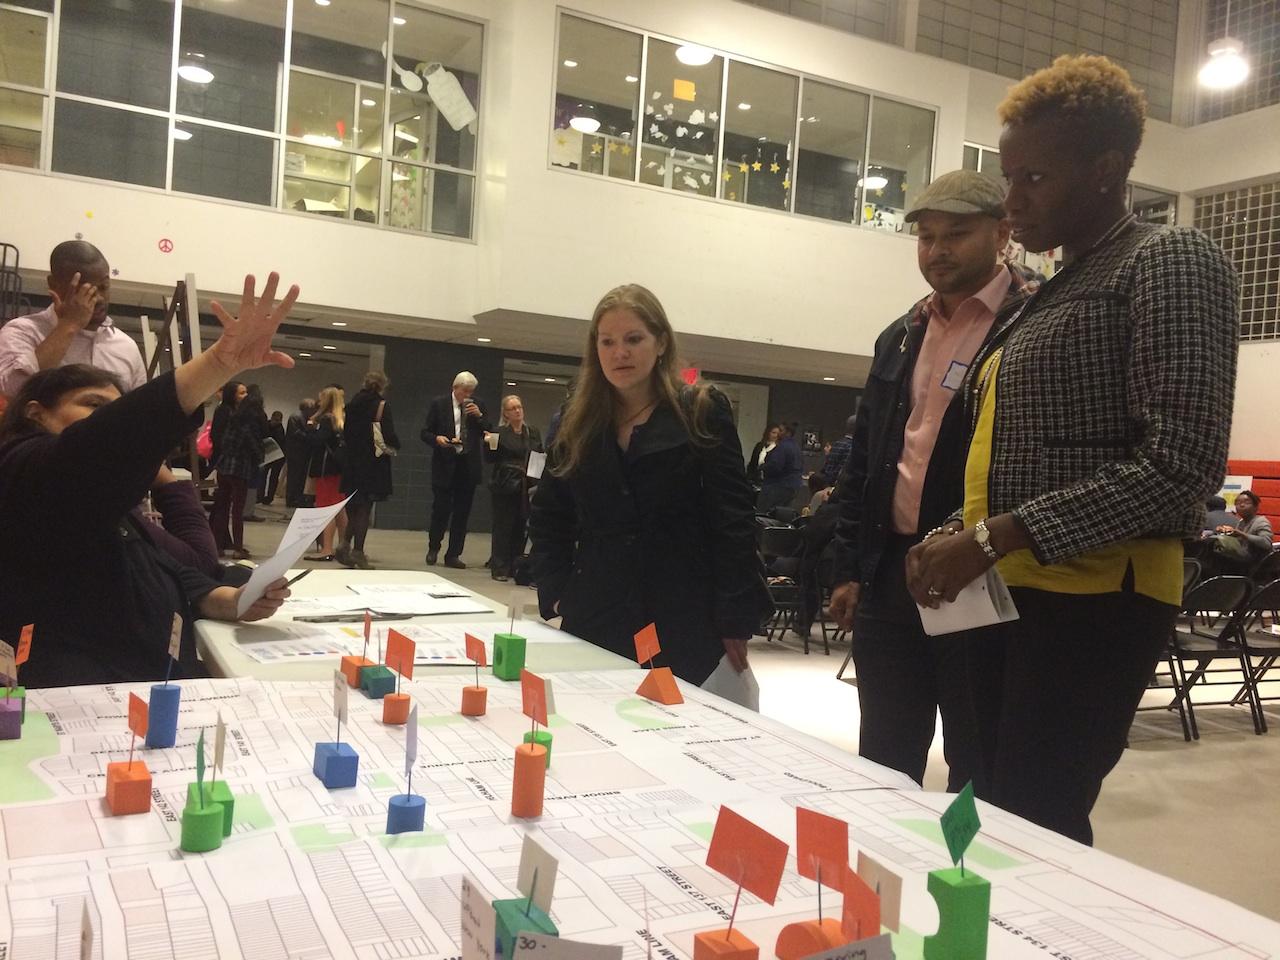 Neighborhood transformation plan unveiled